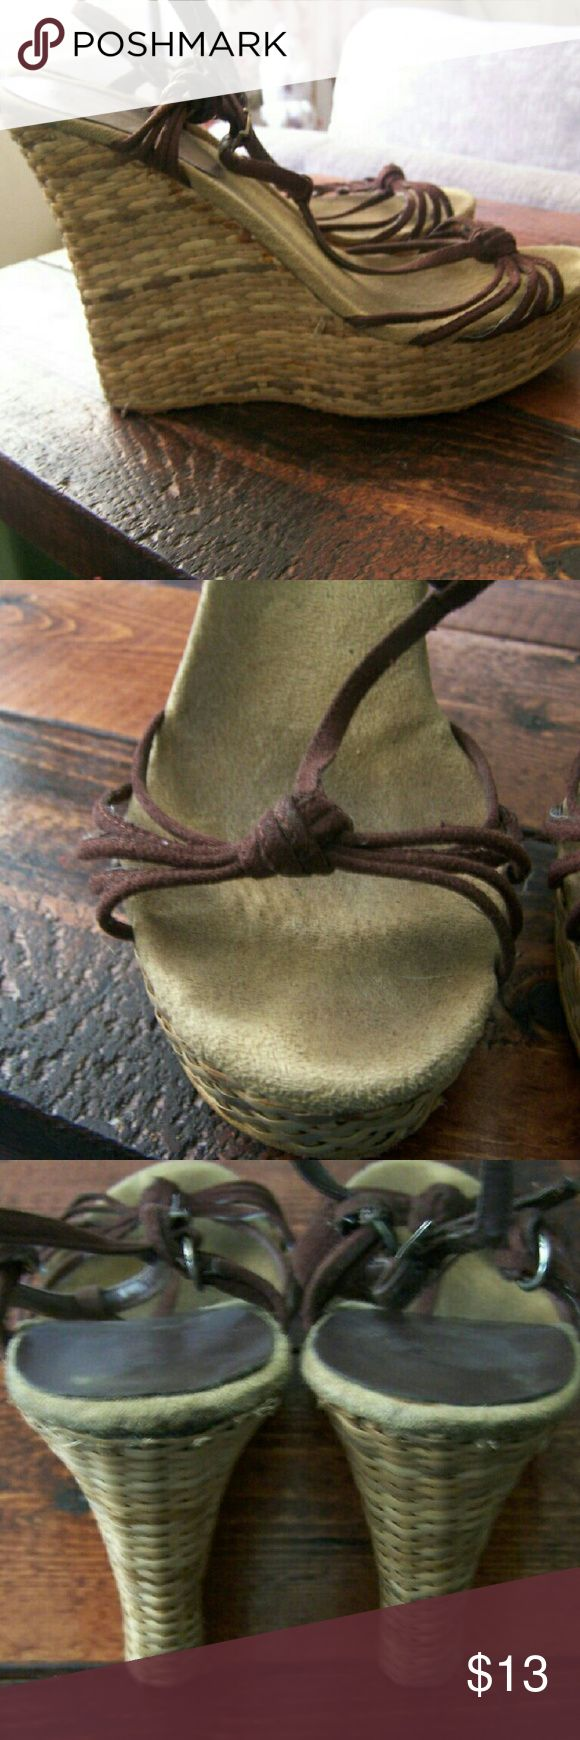 Colin Stuart Wedge Sandals Have some wear. Cat friendly home. Colin Stuart Shoes Wedges